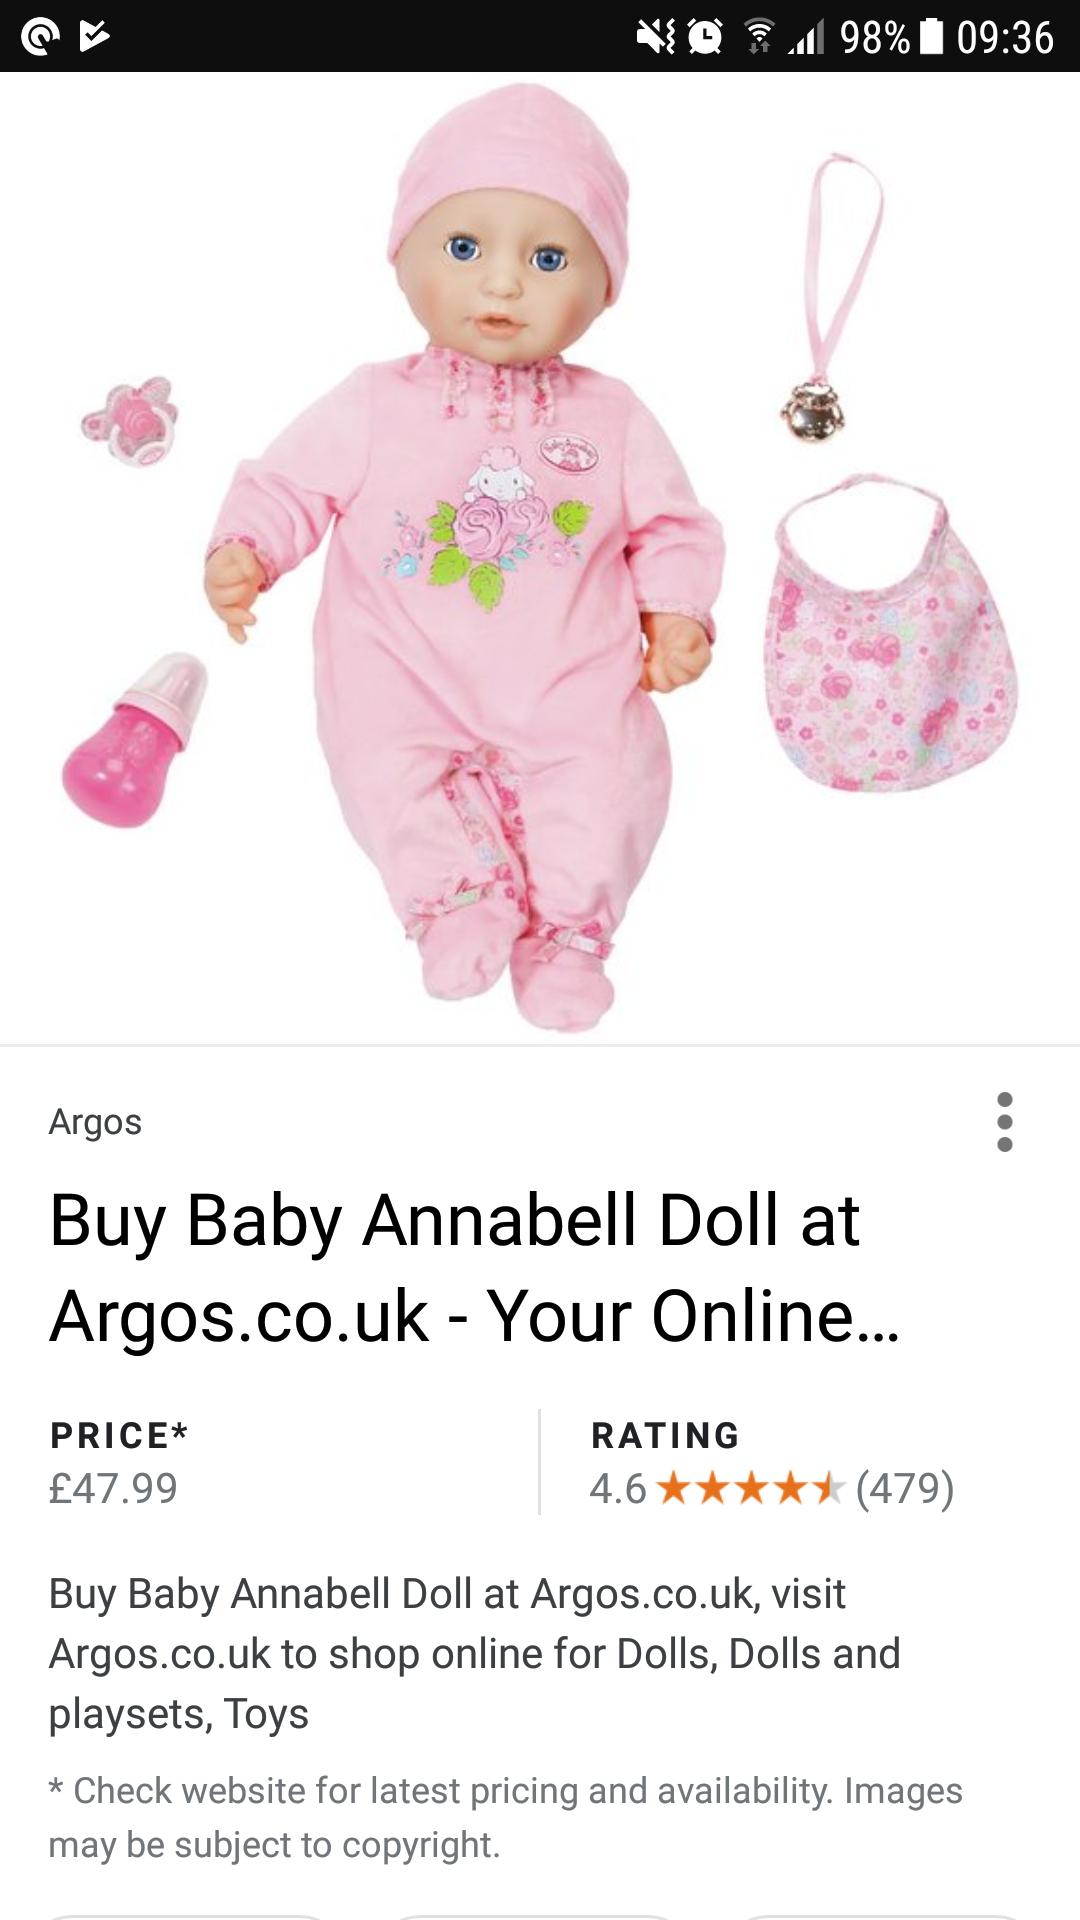 Baby annabell amazon - £34.87